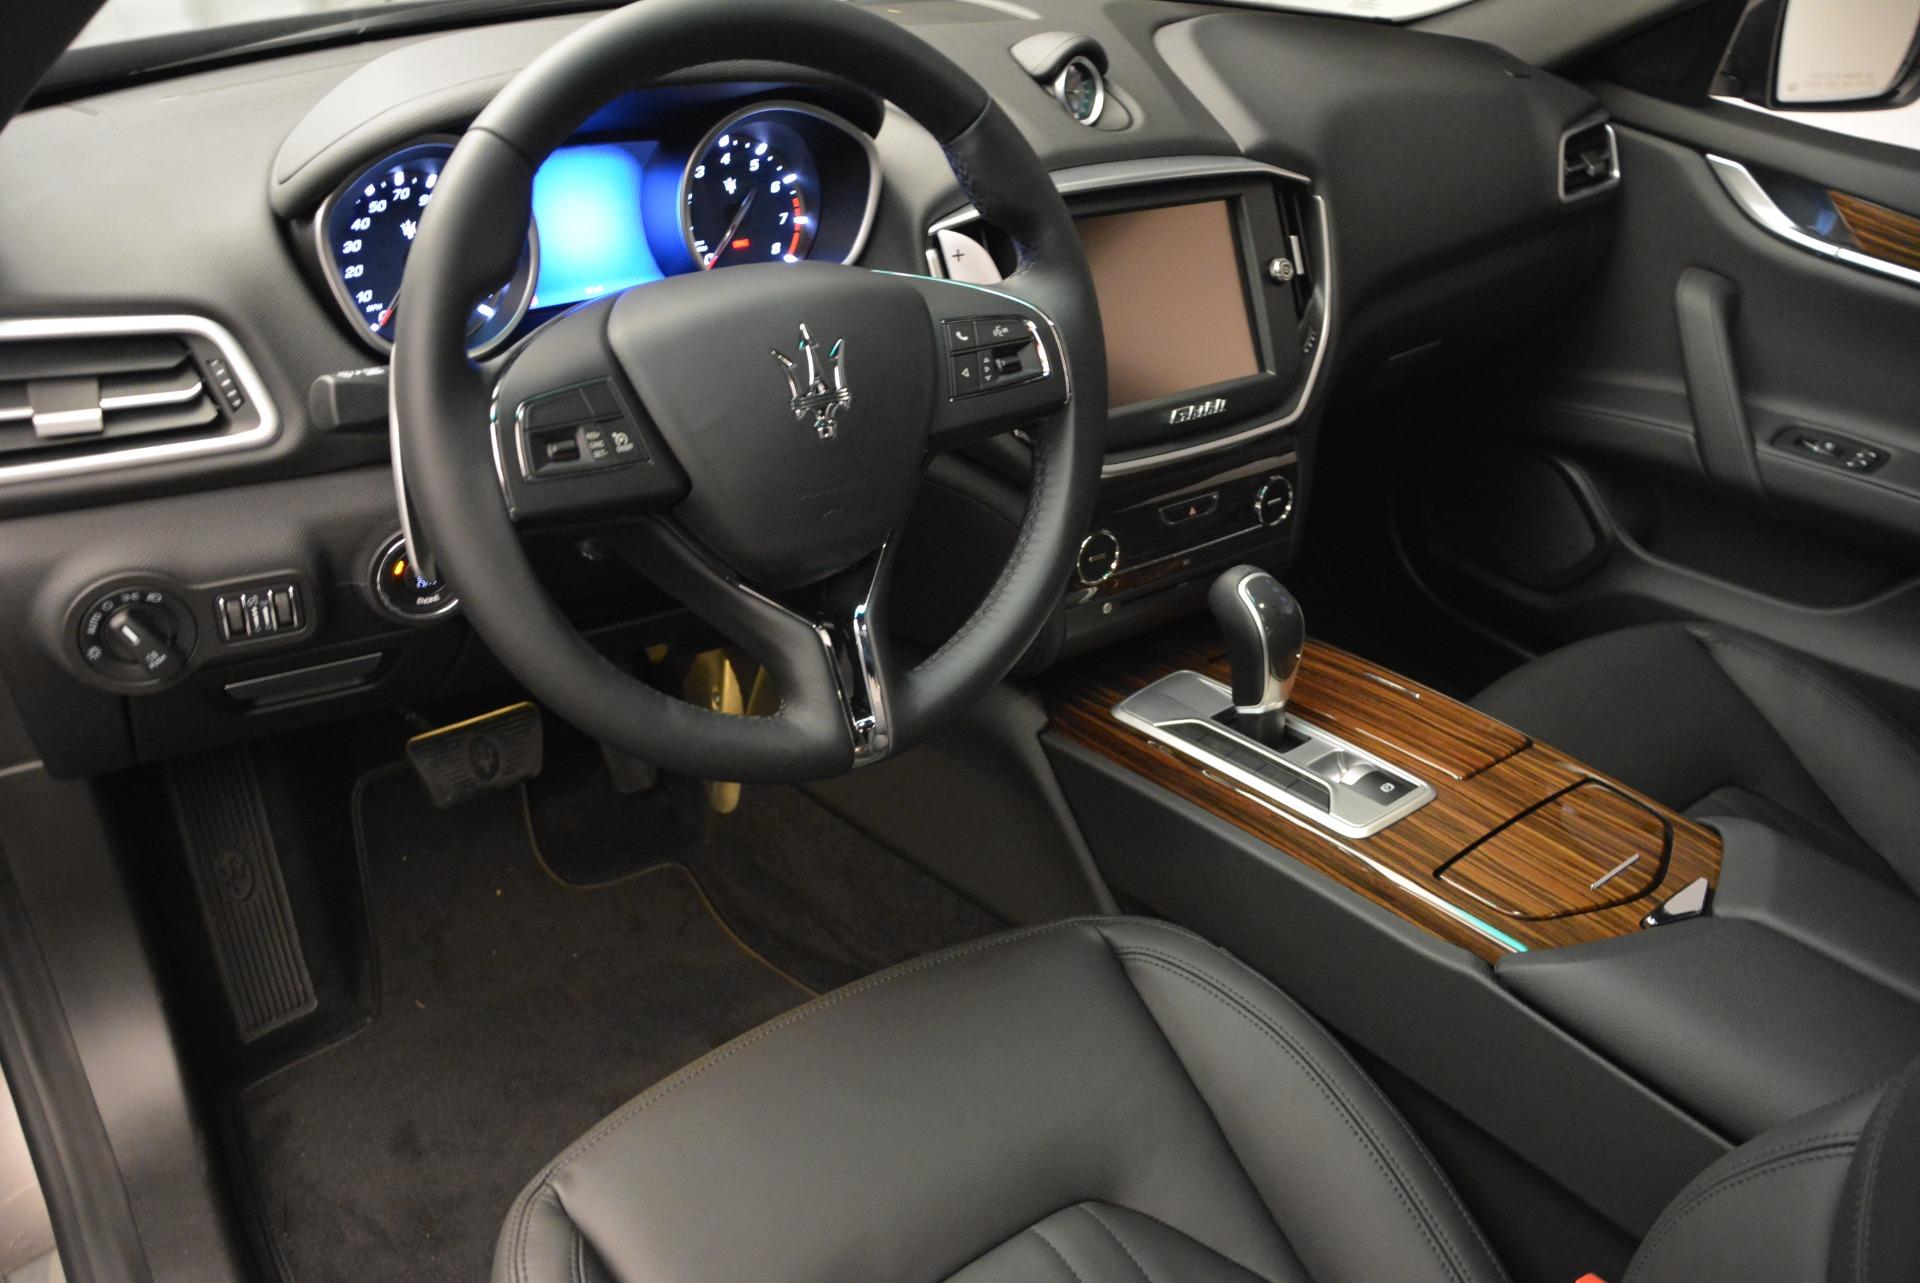 Used 2014 Maserati Ghibli S Q4 For Sale In Greenwich, CT. Alfa Romeo of Greenwich, 7426 2562_p14